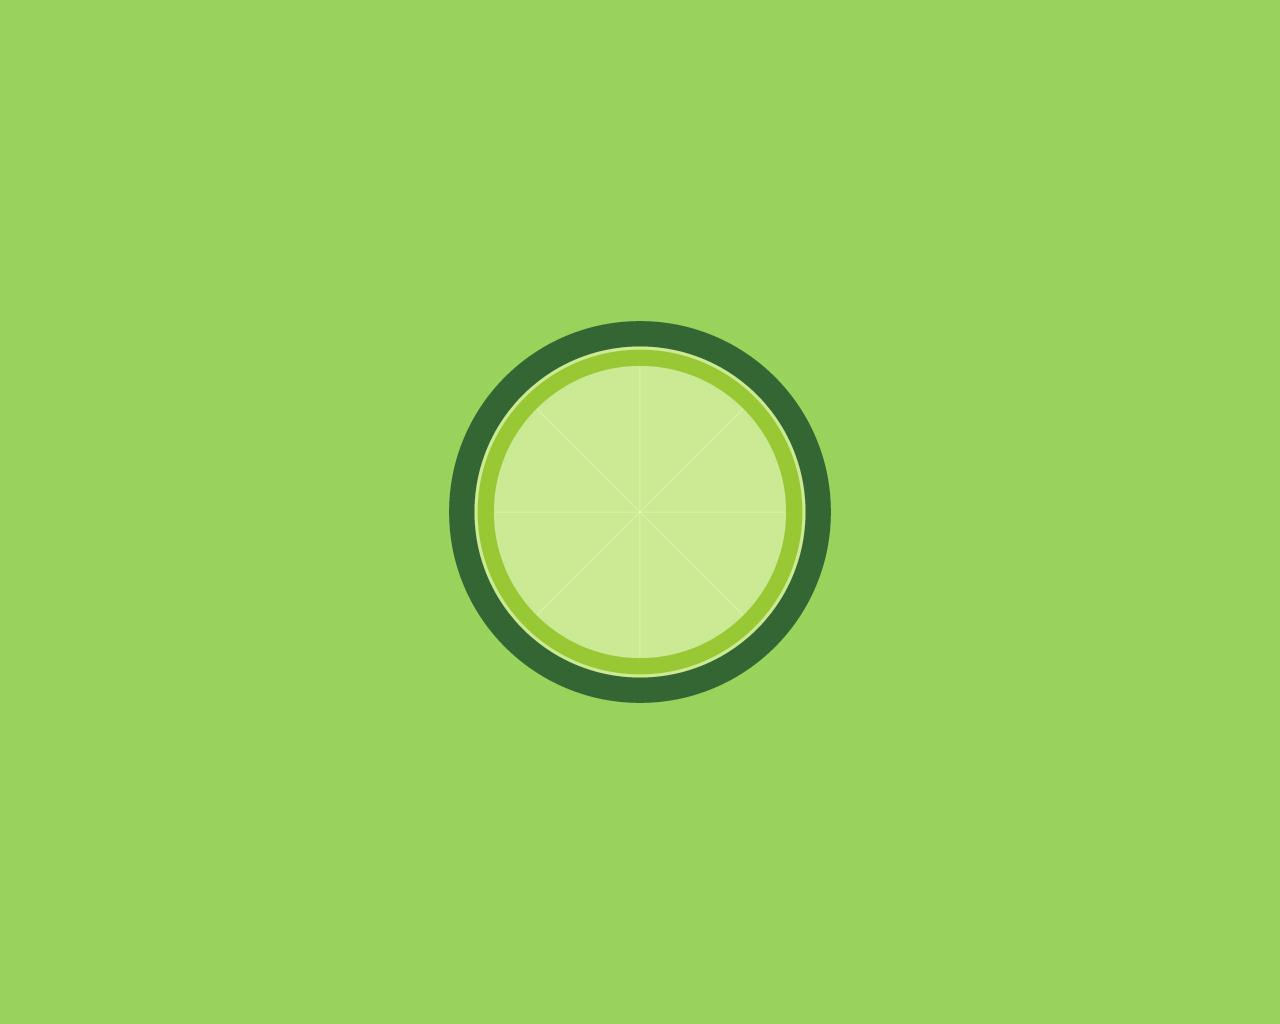 Super Green Coool Wallpapers Part 5